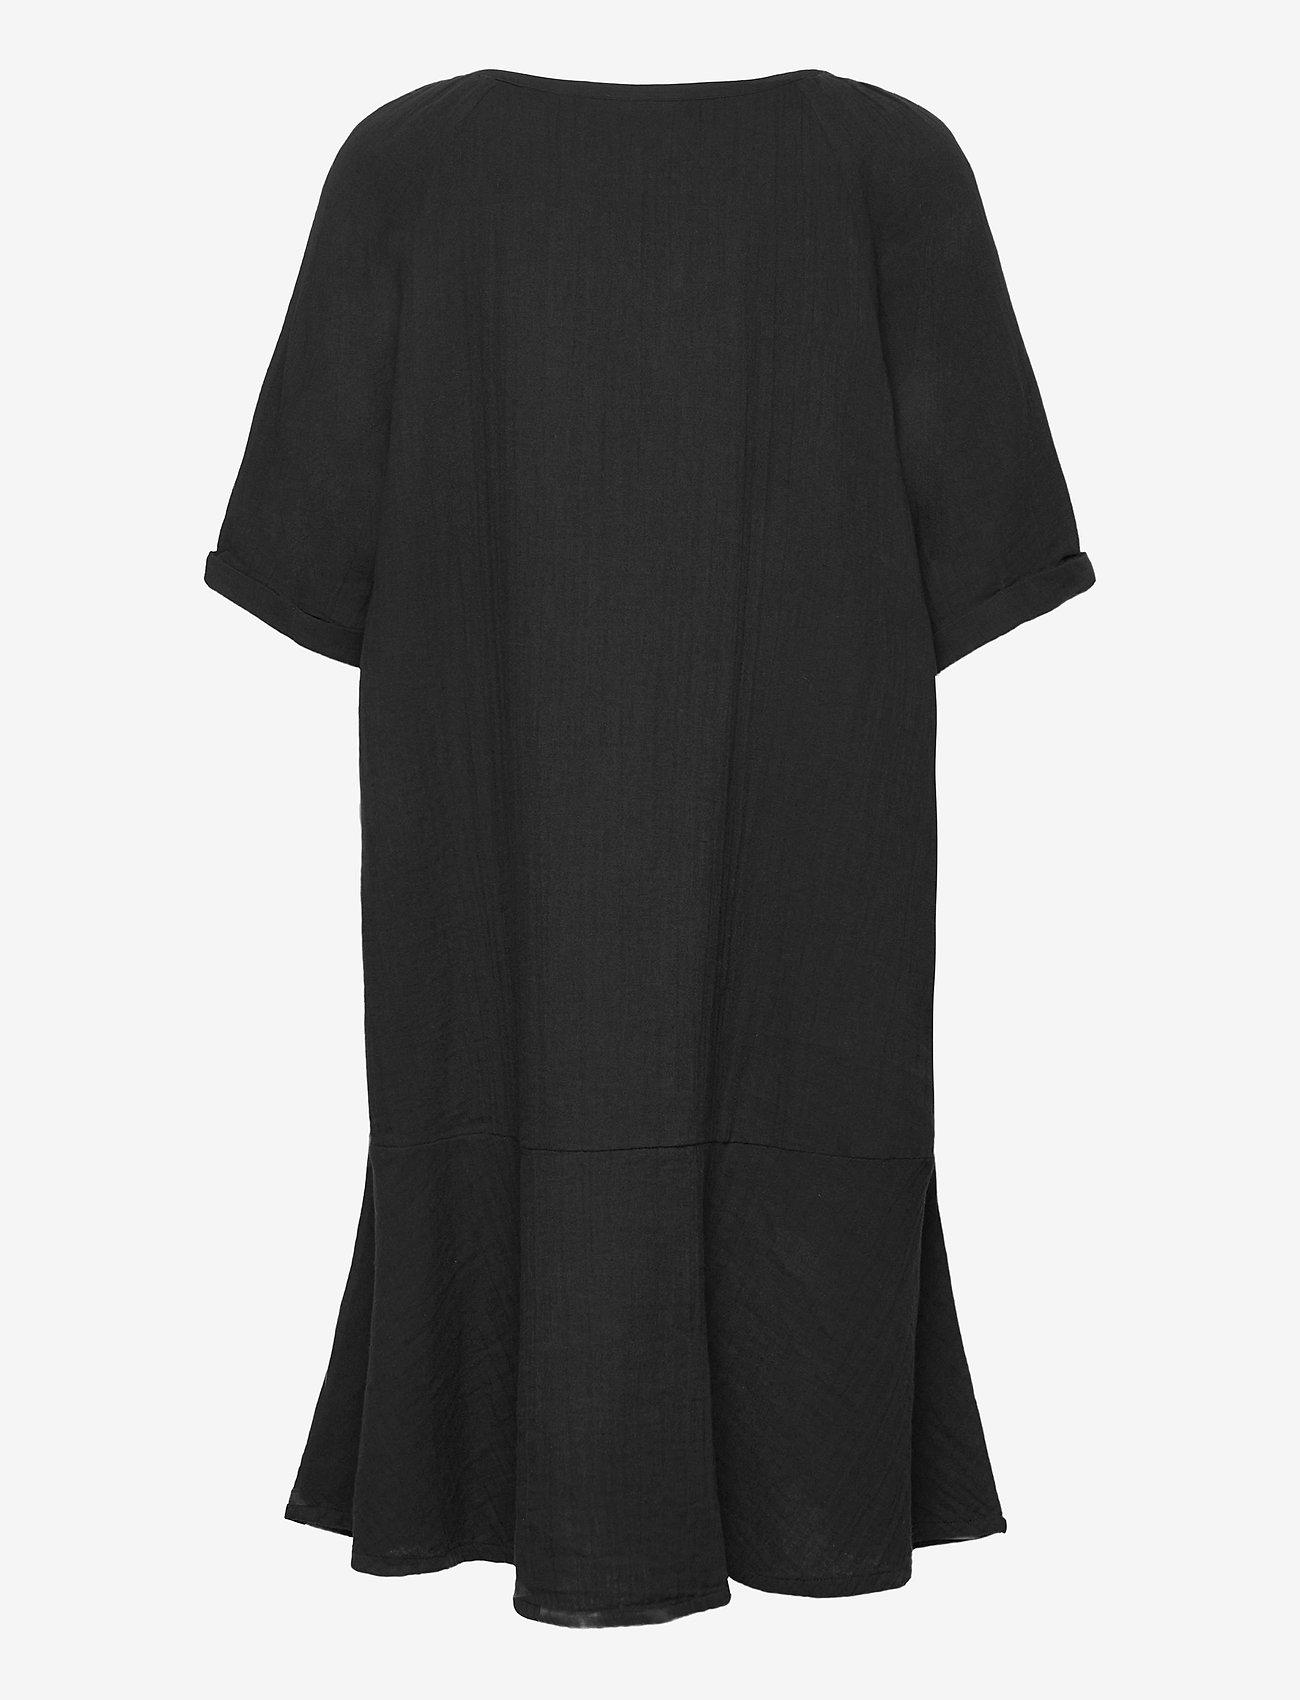 Masai - Nebis - sukienki na codzień - black - 1